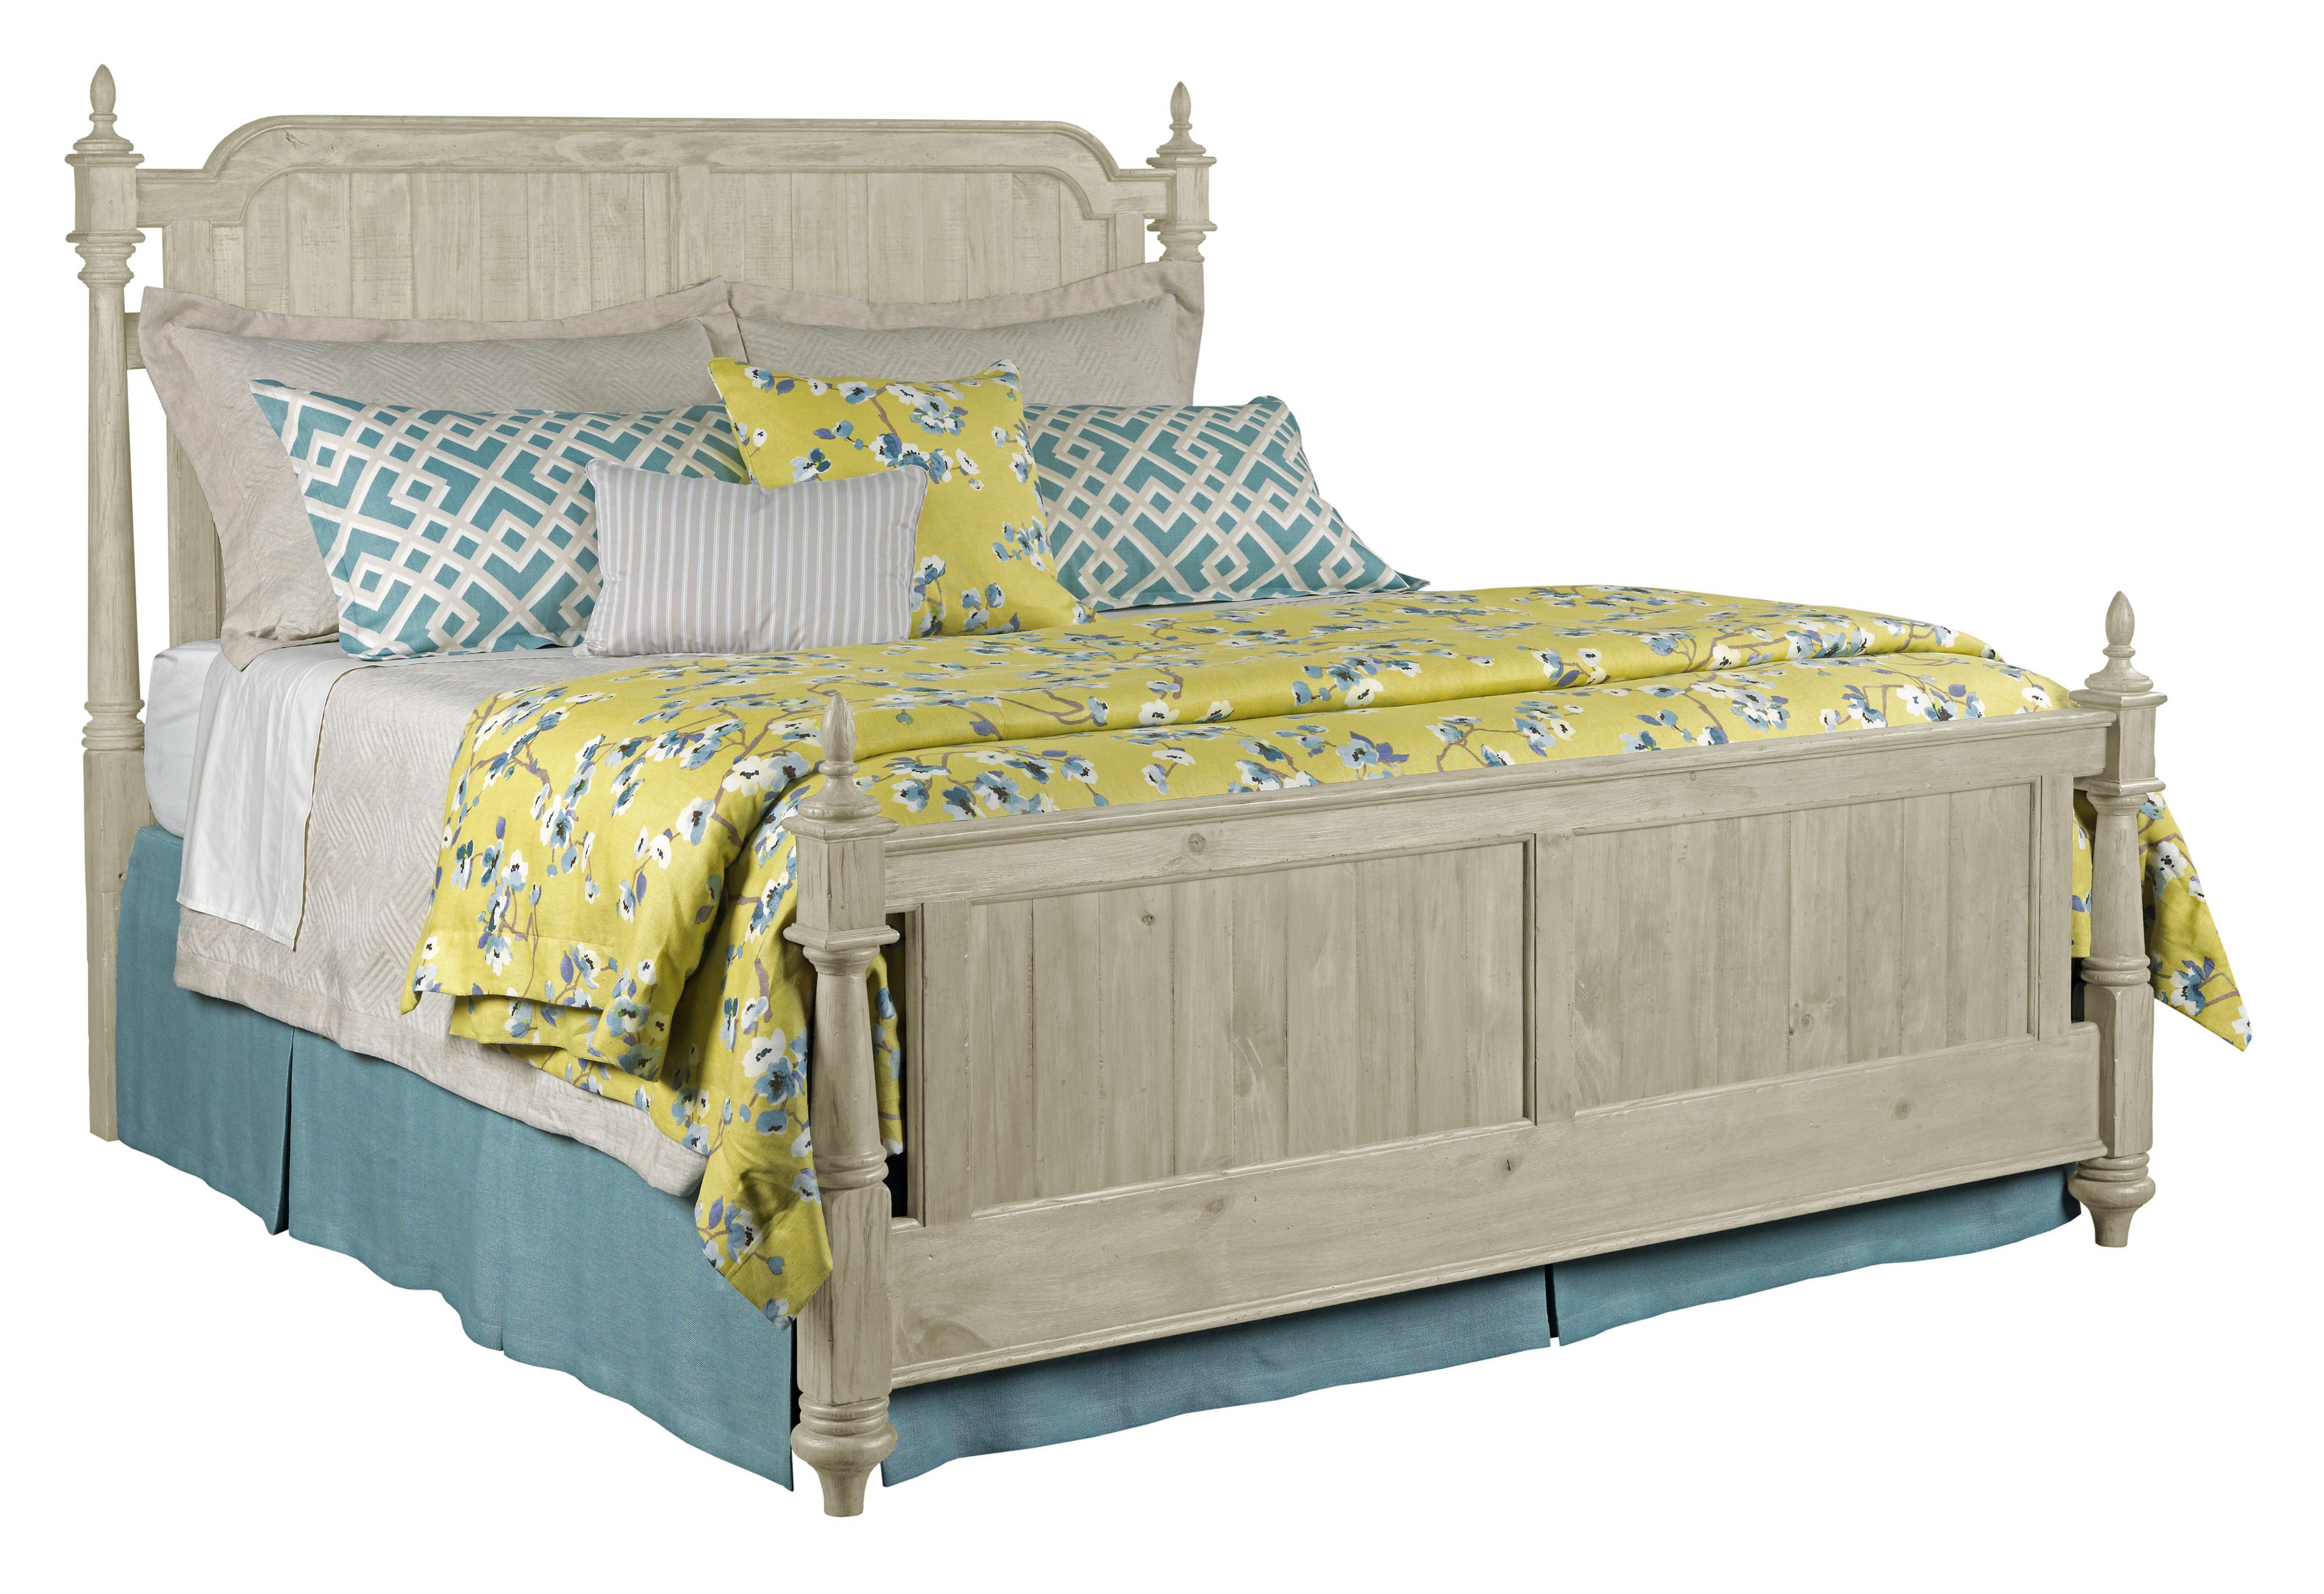 Kincaid Westland King Bed